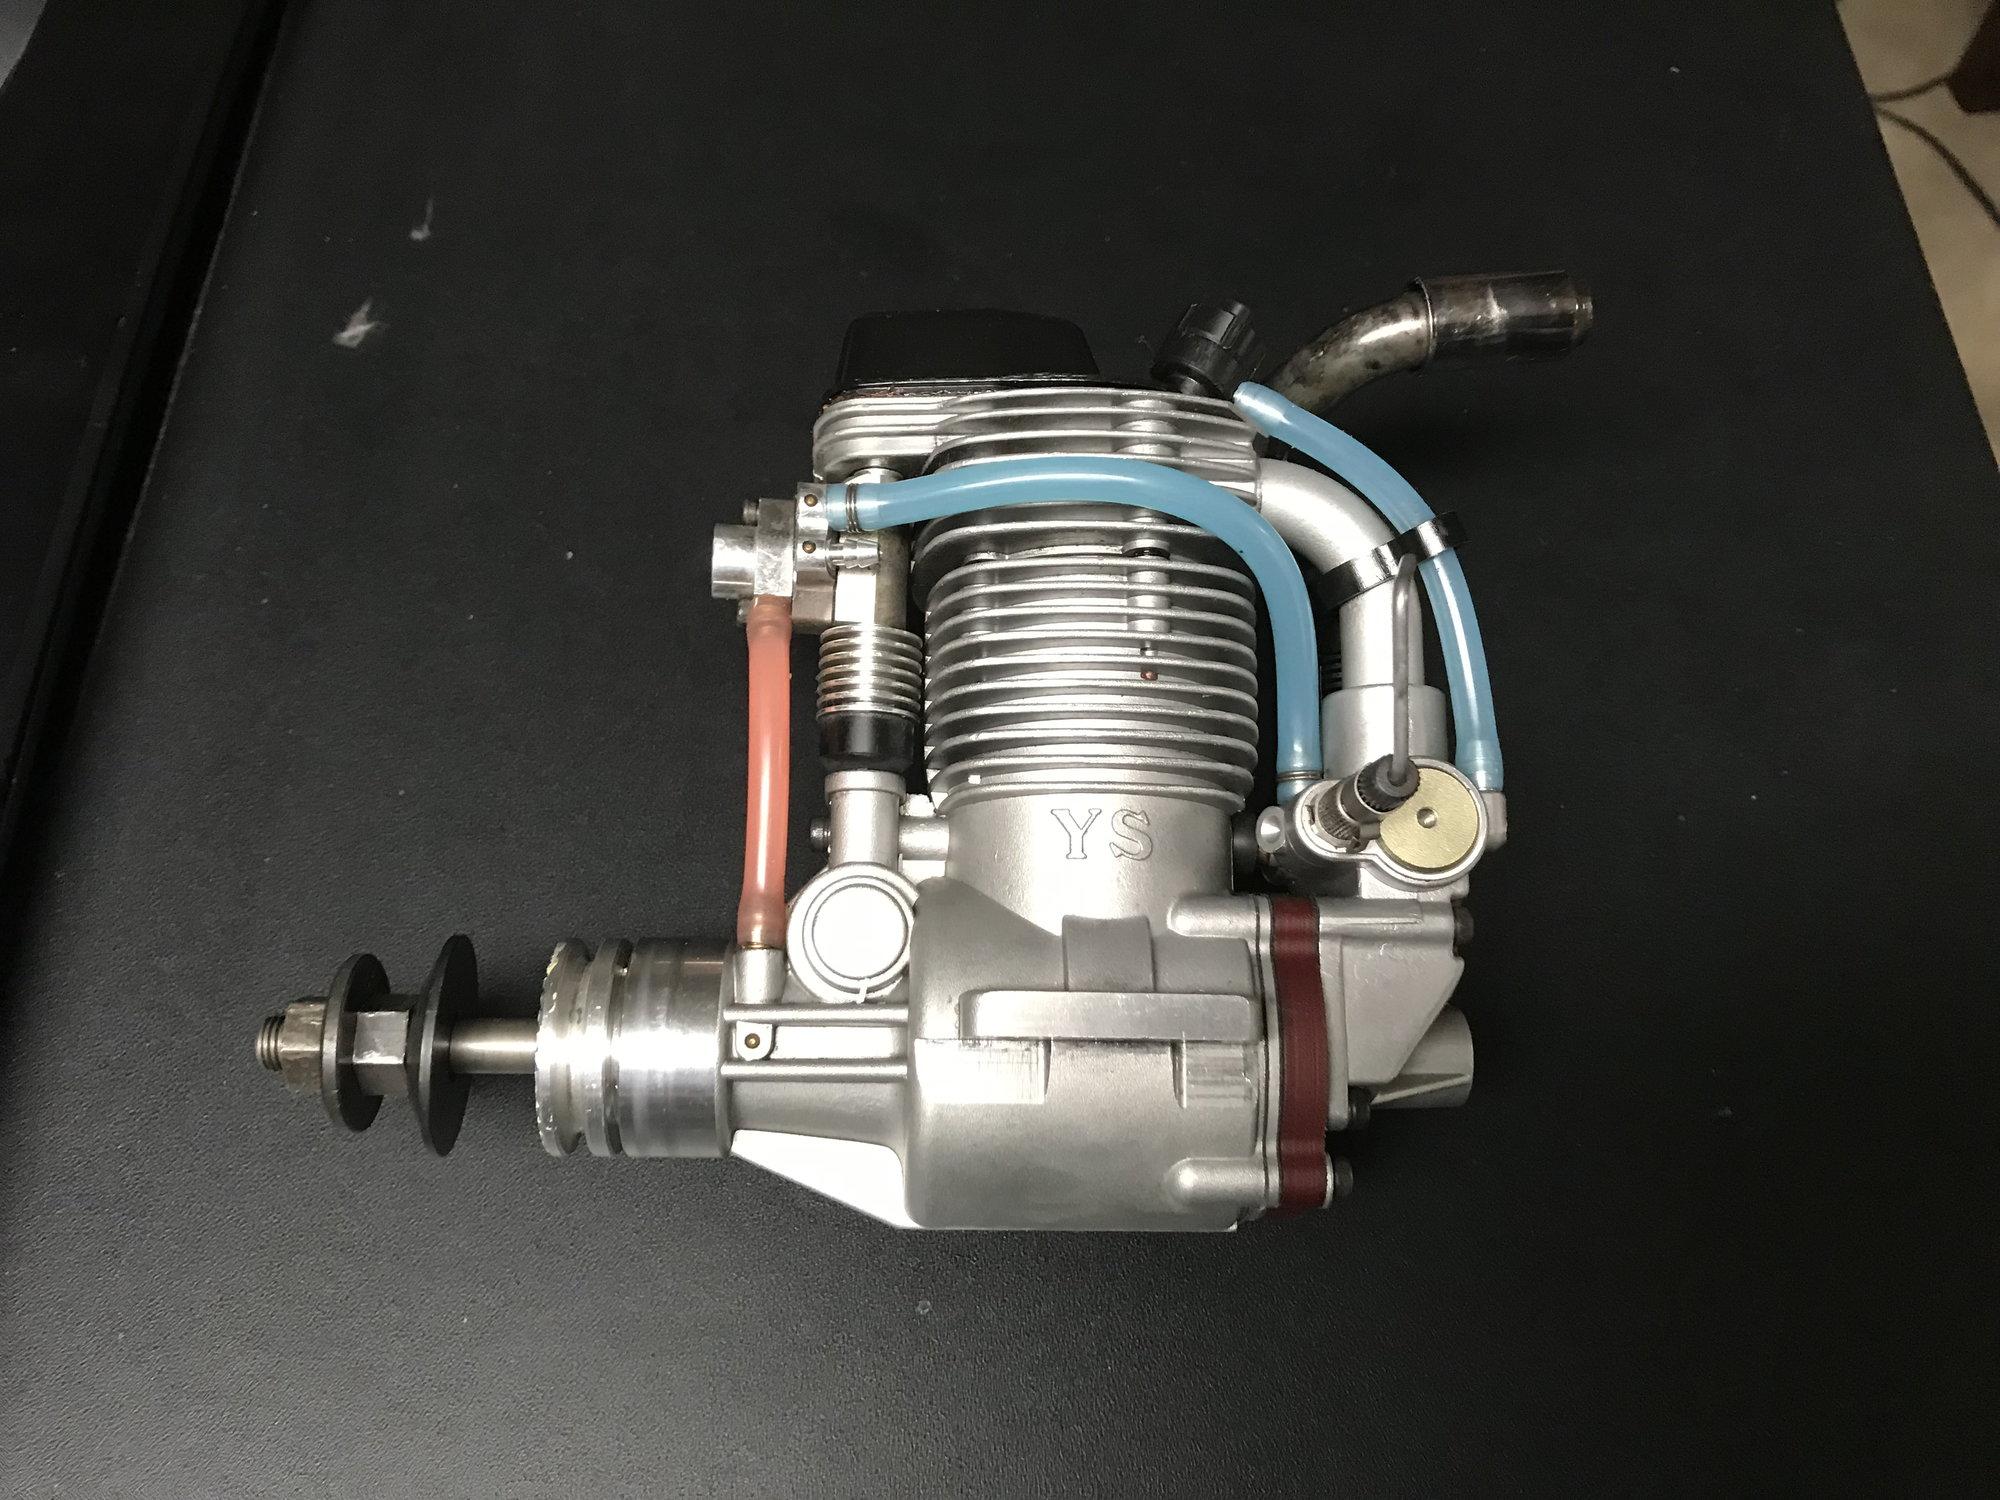 ys 4 stroke engines